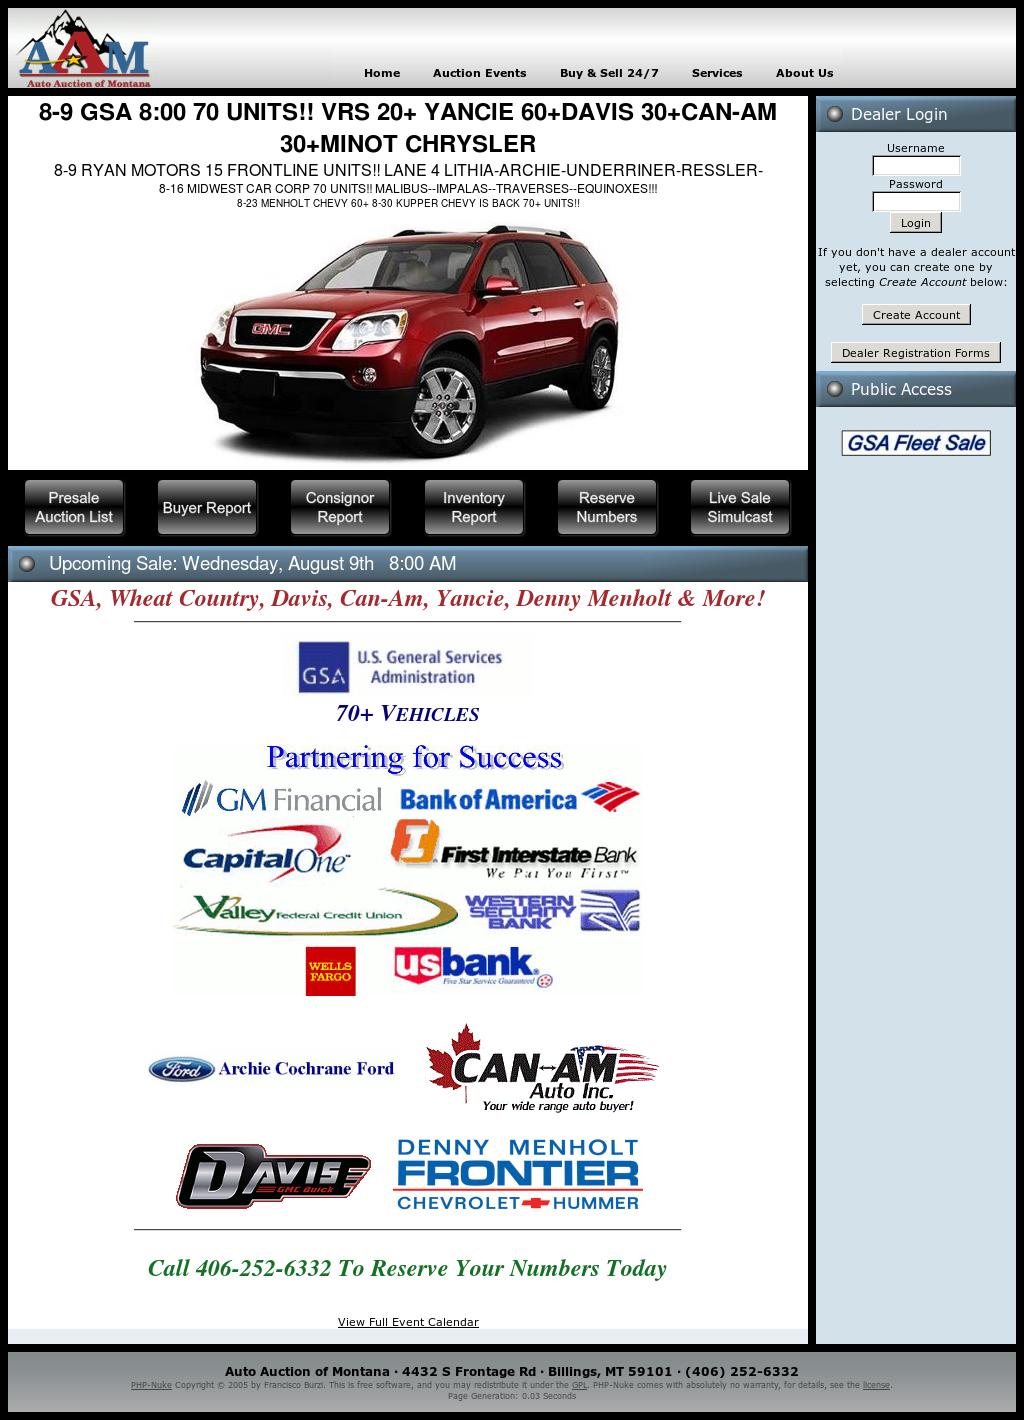 Auto Auction Associates Of Montana Competitors, Revenue and